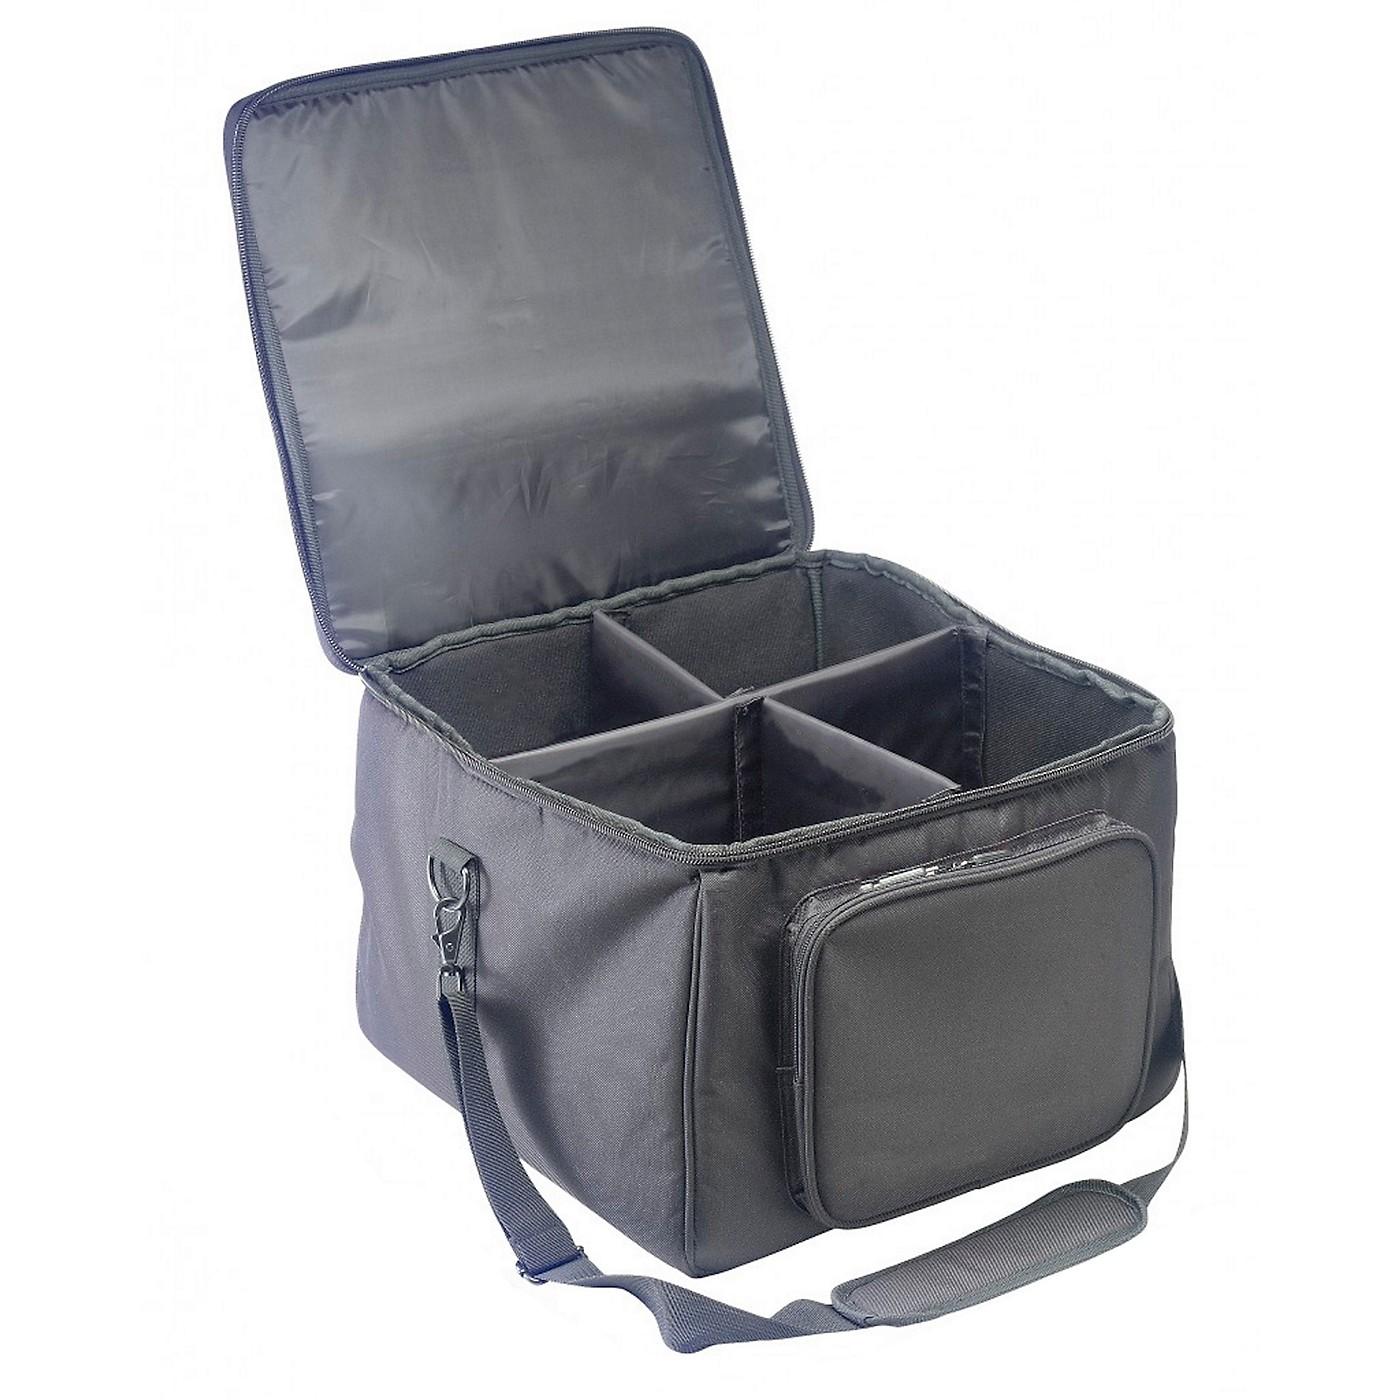 Stagg SLI-TB-4 Reinforced Transport Bag for 4 LED Lights thumbnail